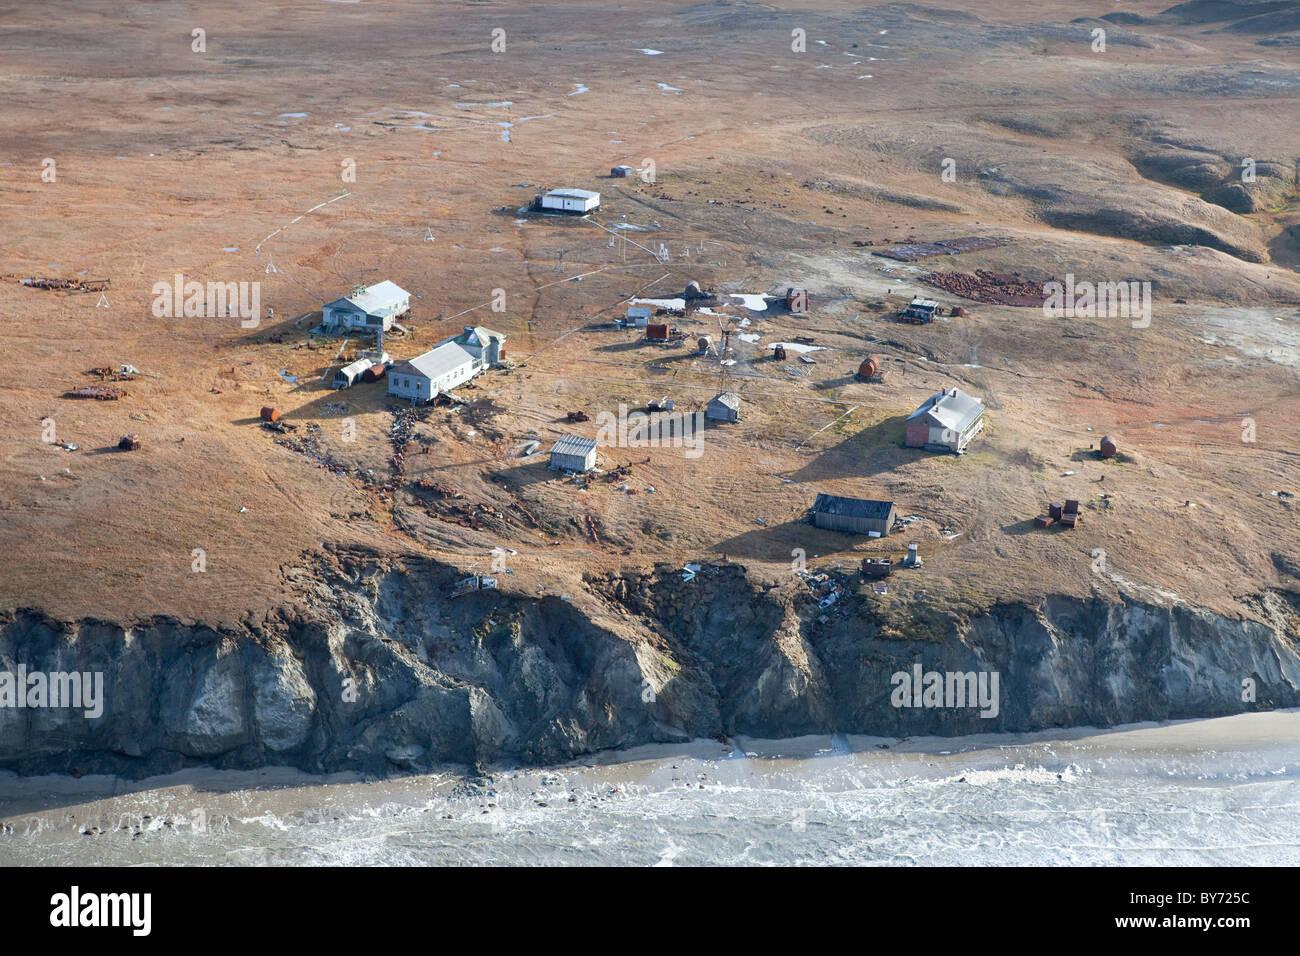 La península de Yamal, Siberia Occidental , Rusia . La tribu Nenet forma de vida se enfrentan a amenazas de Imagen De Stock